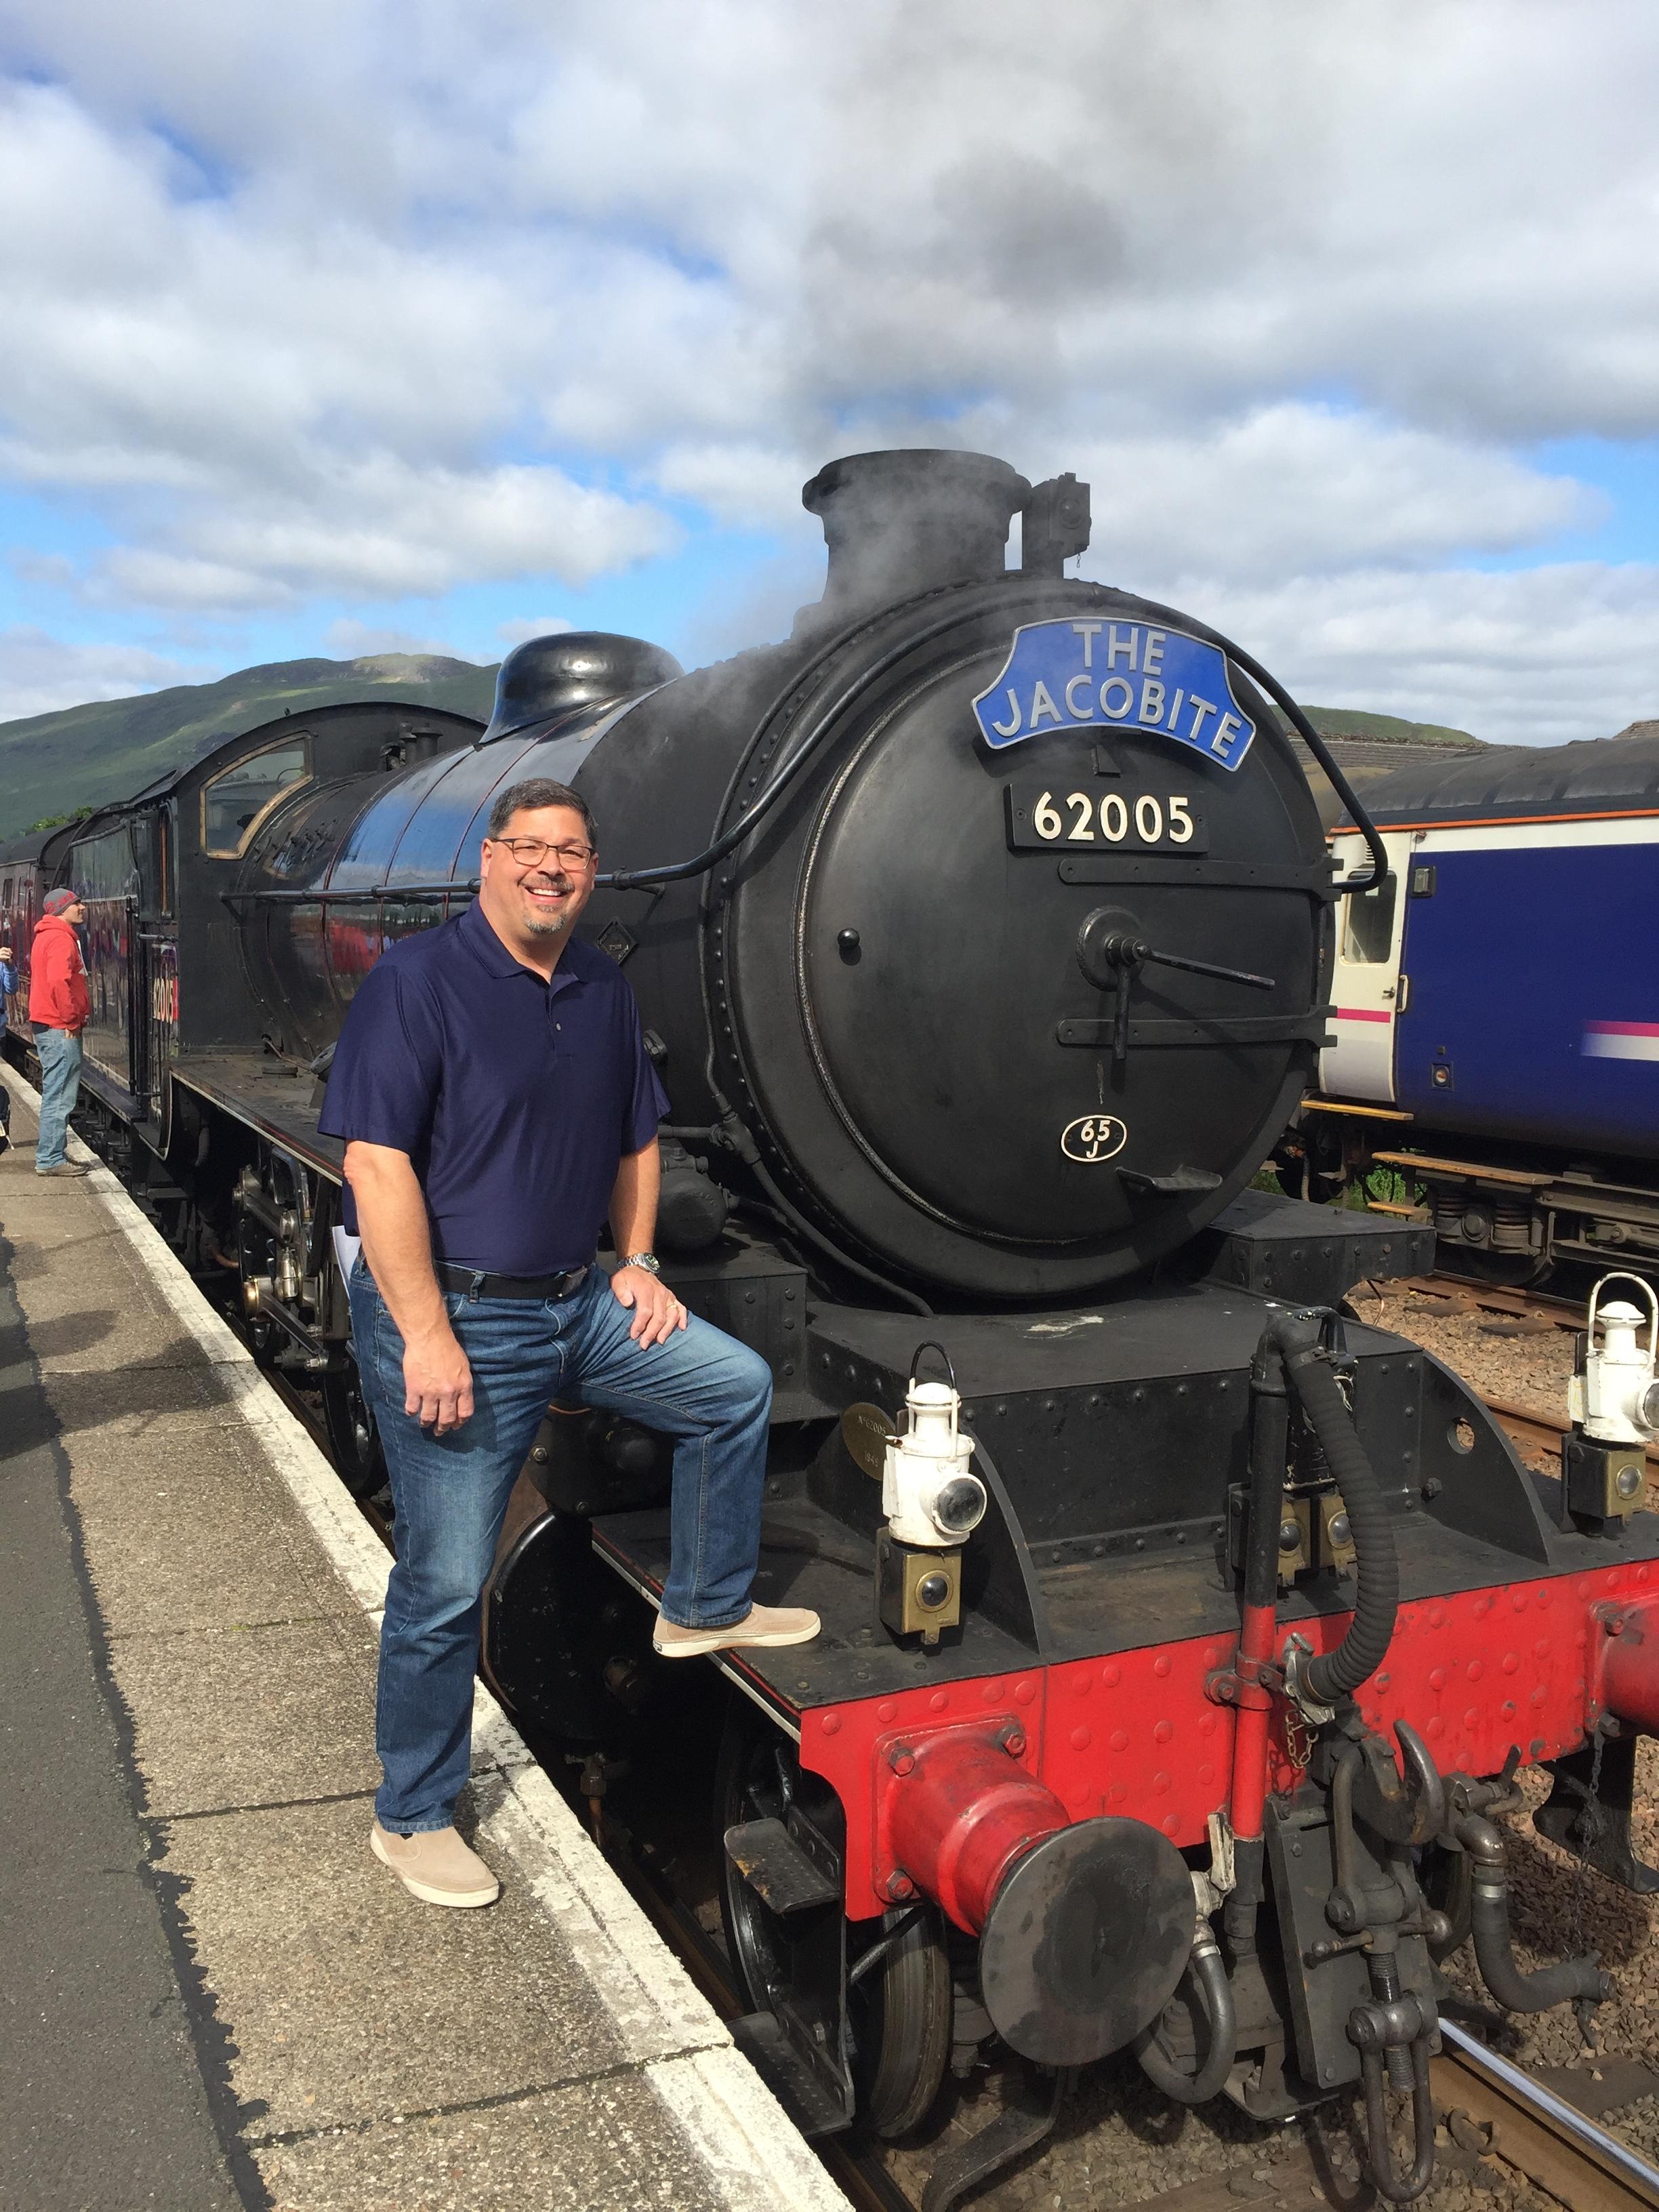 Jacobite Steam Train Tour